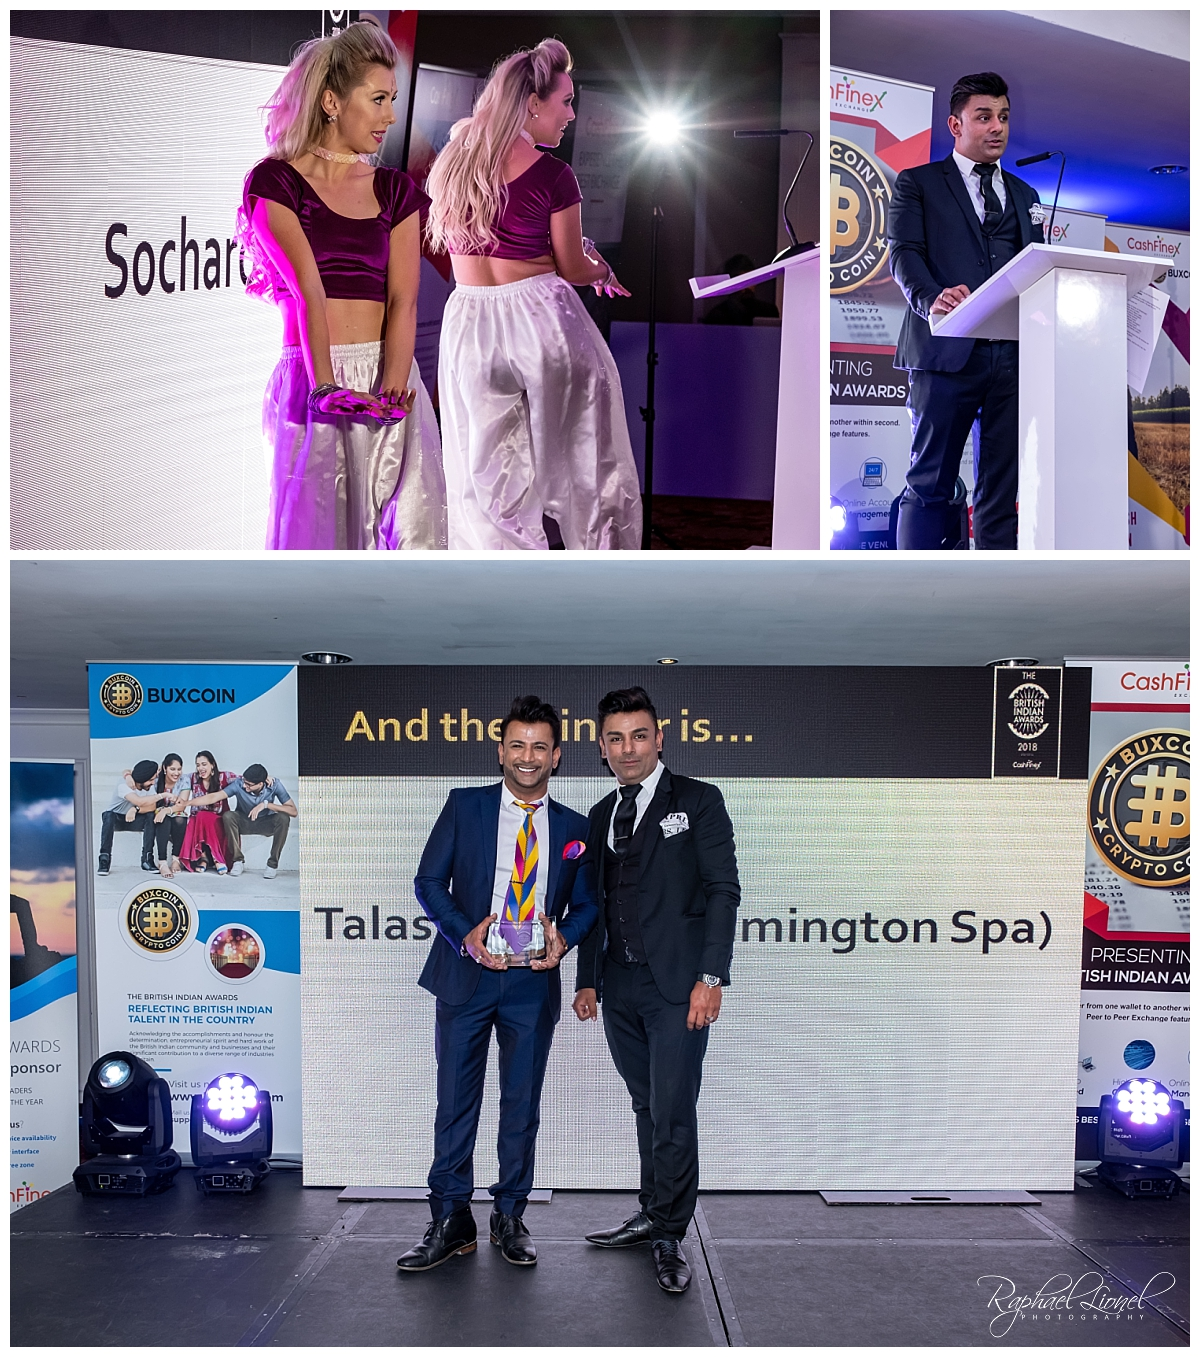 British Indian Awards 2 - British Indian Awards 2018 St Johns Hotel